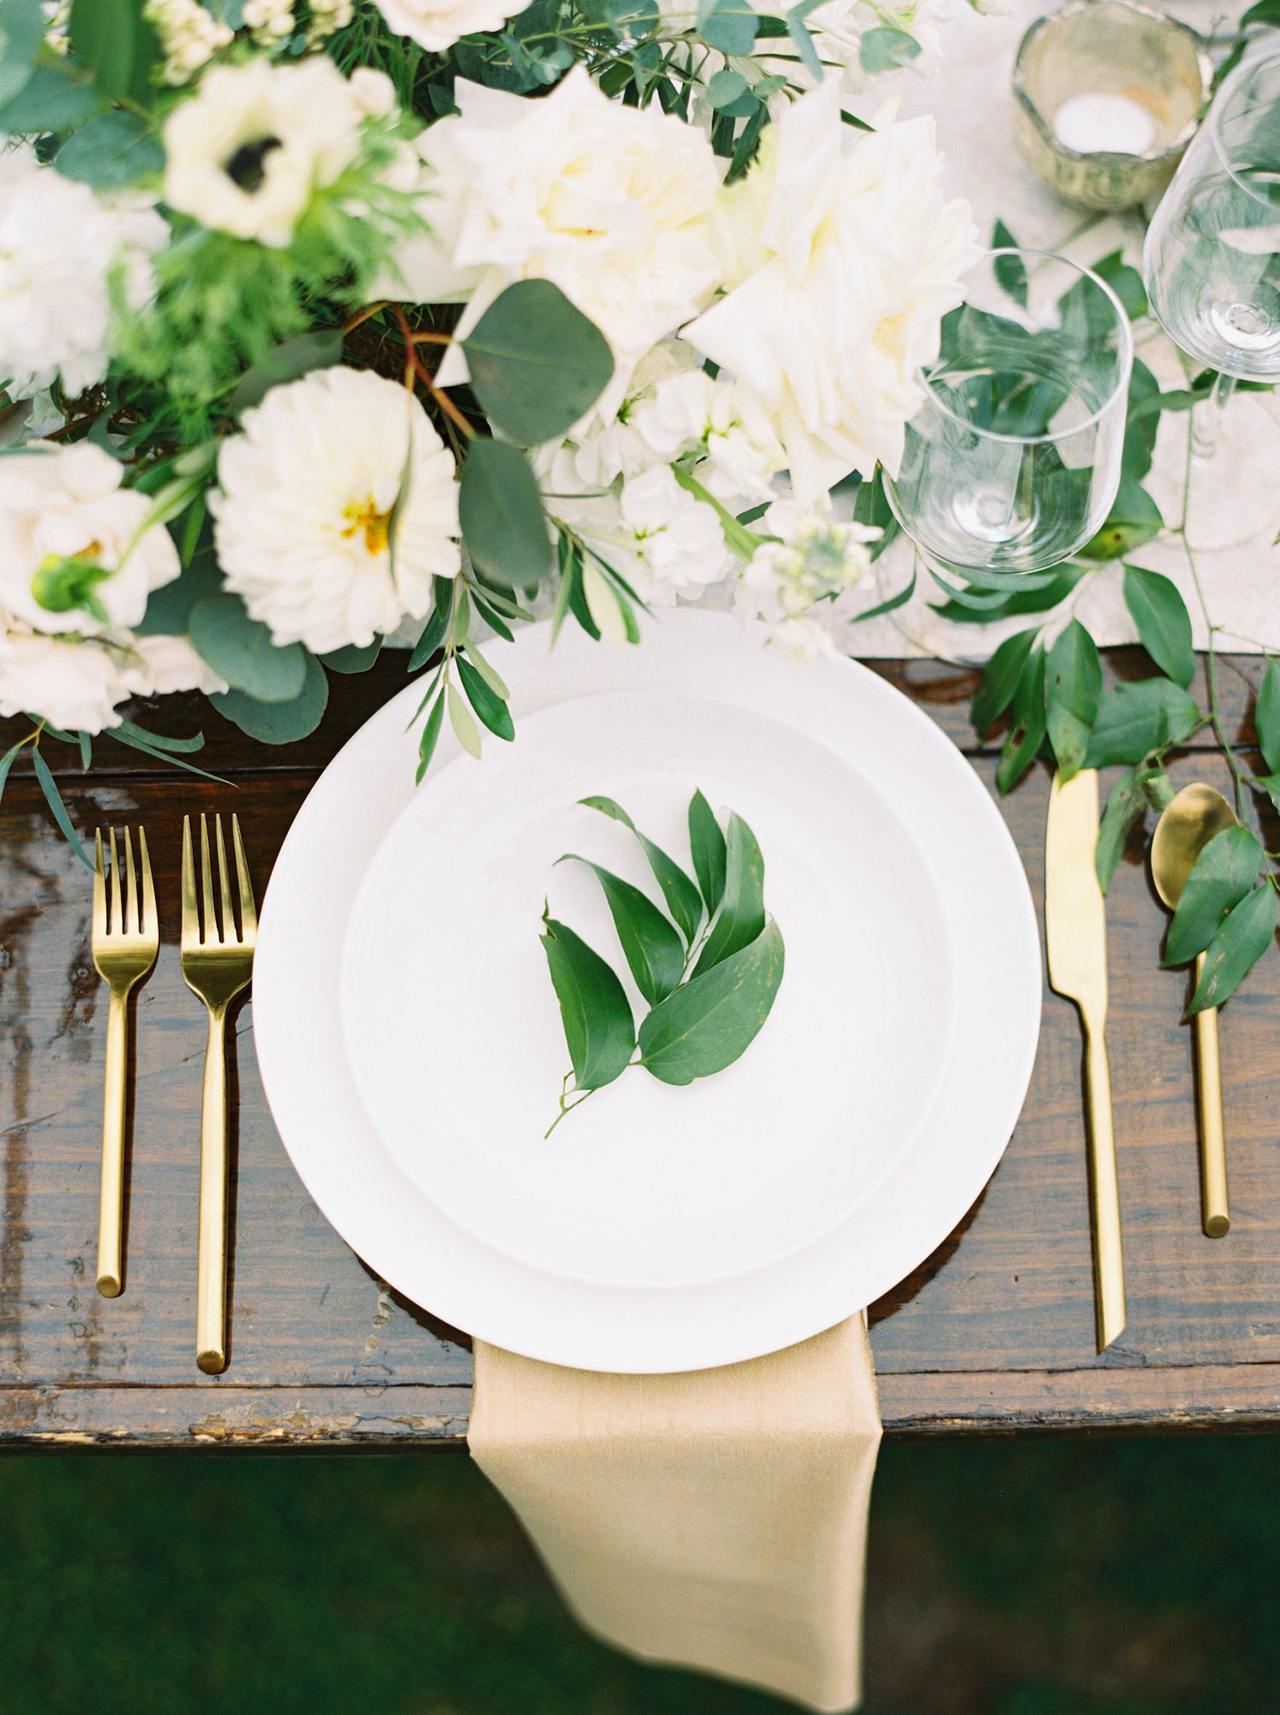 kathleen henry wedding place settings